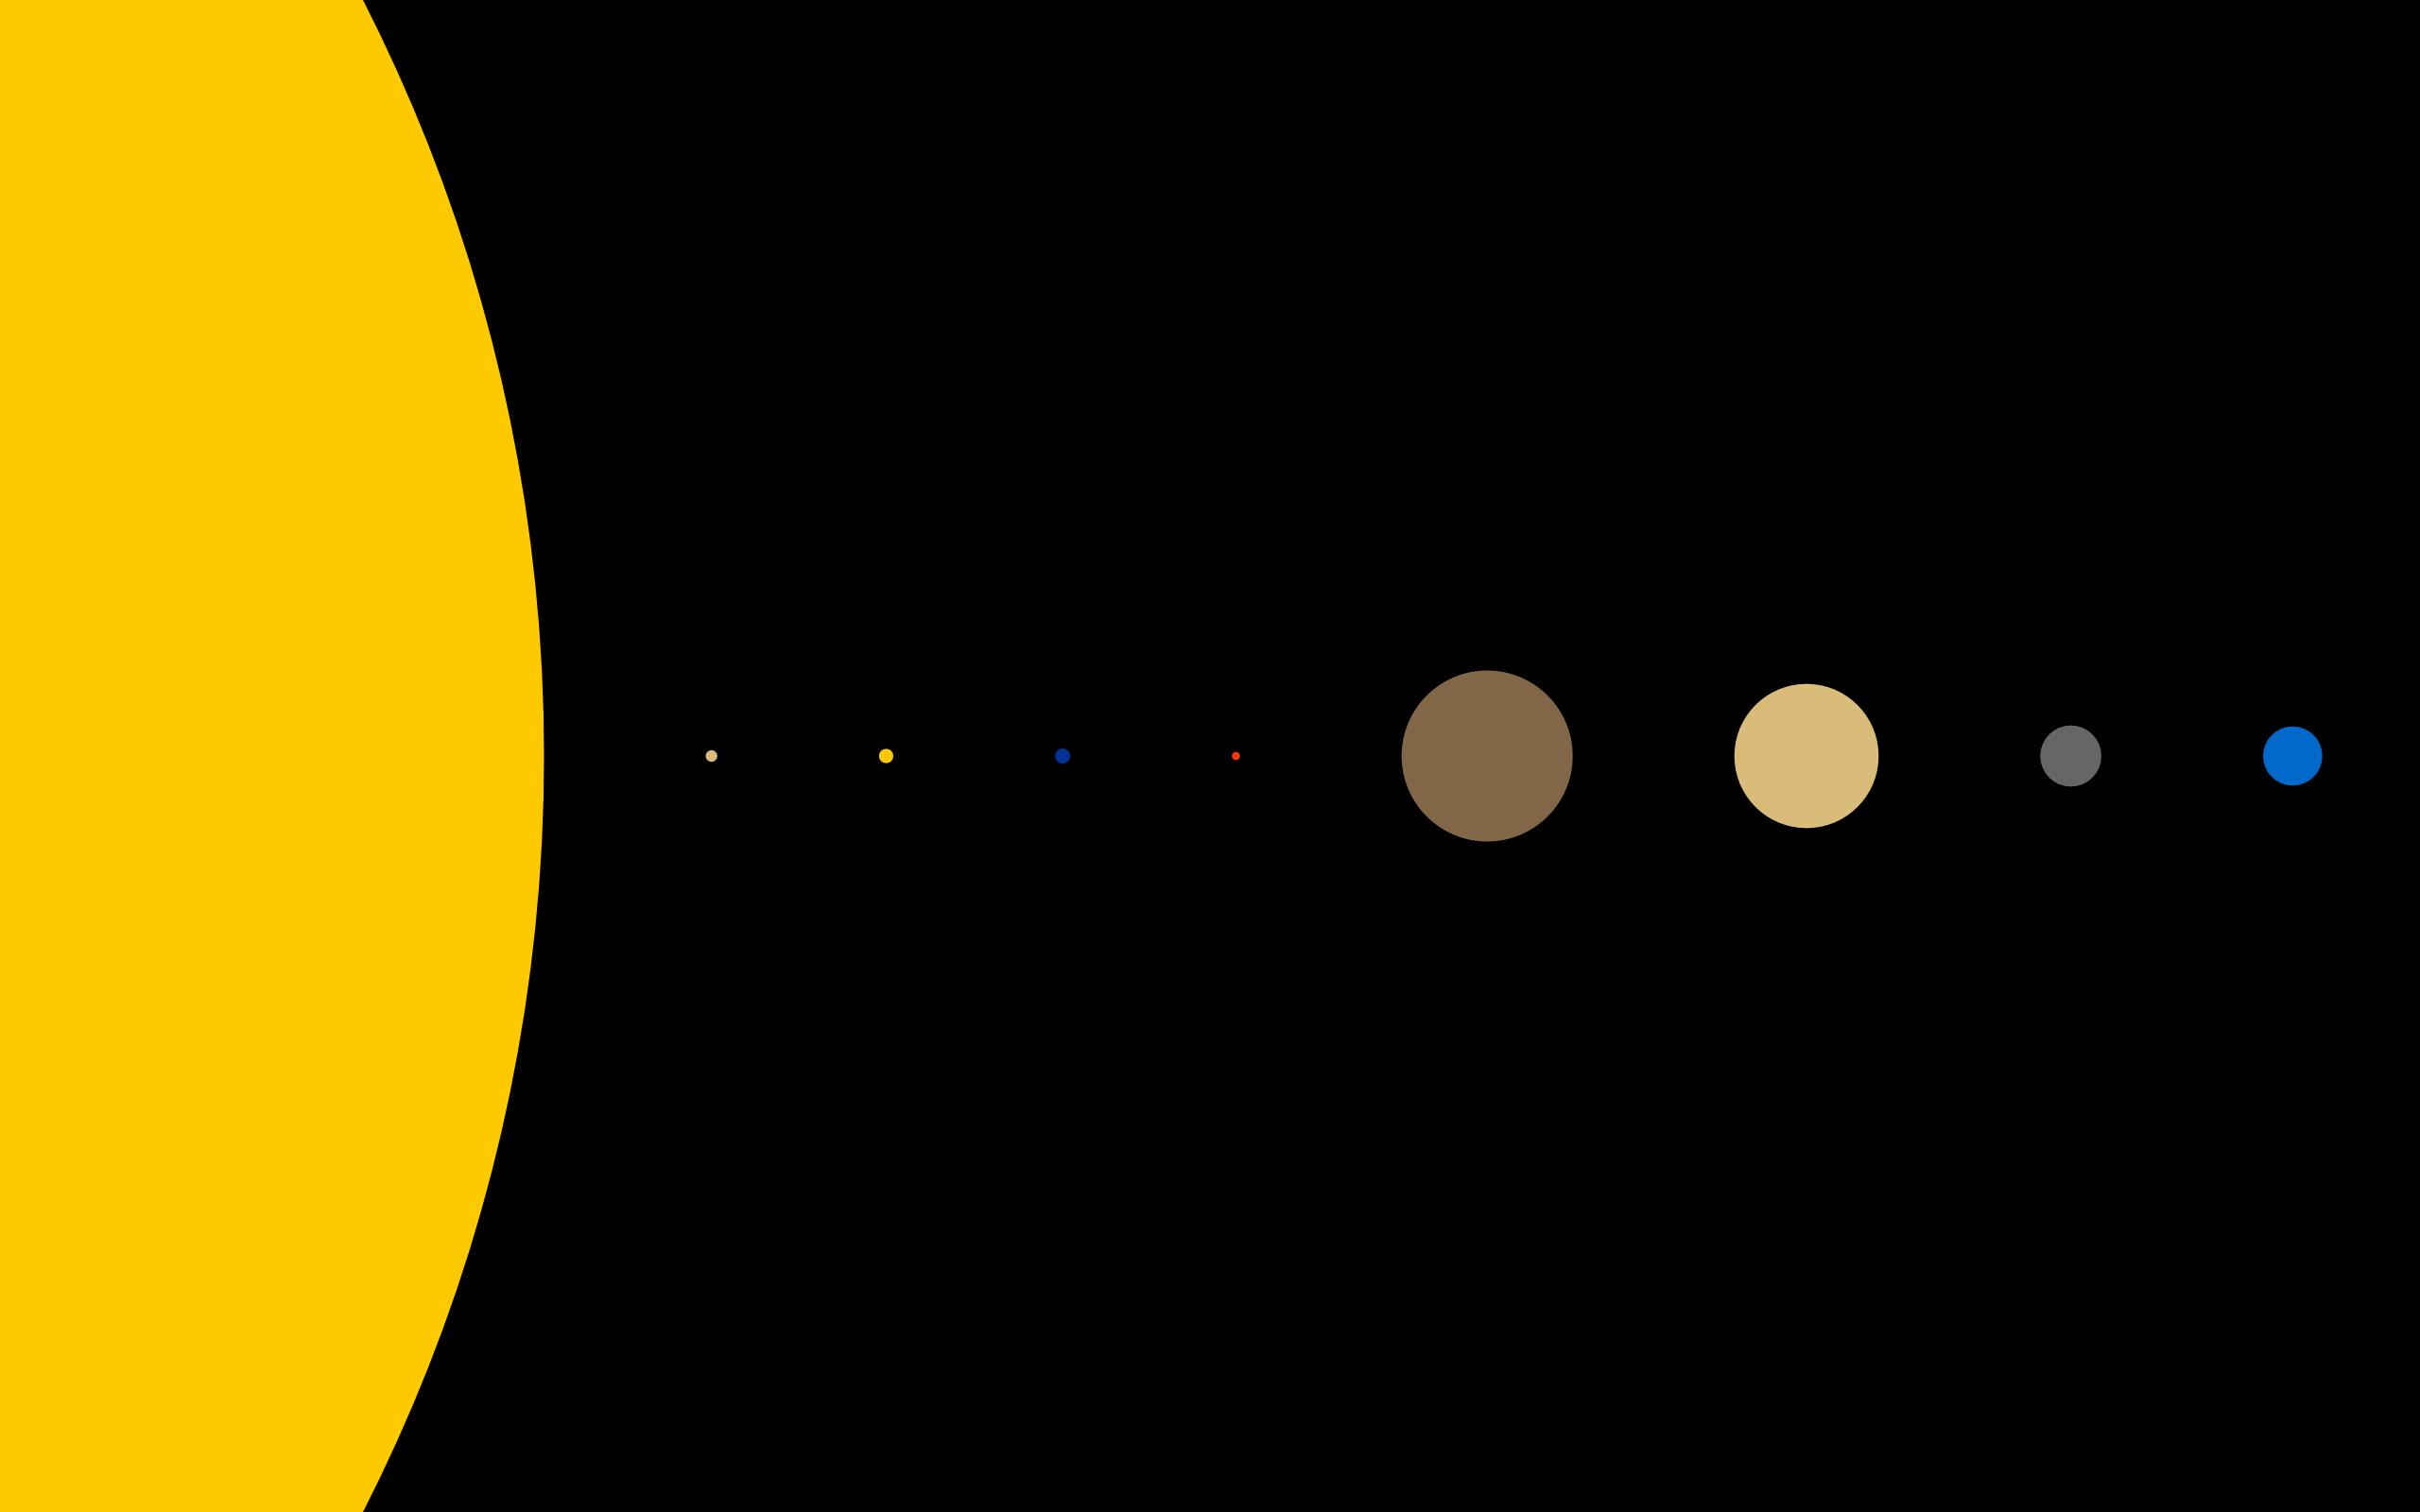 Planets Intruder